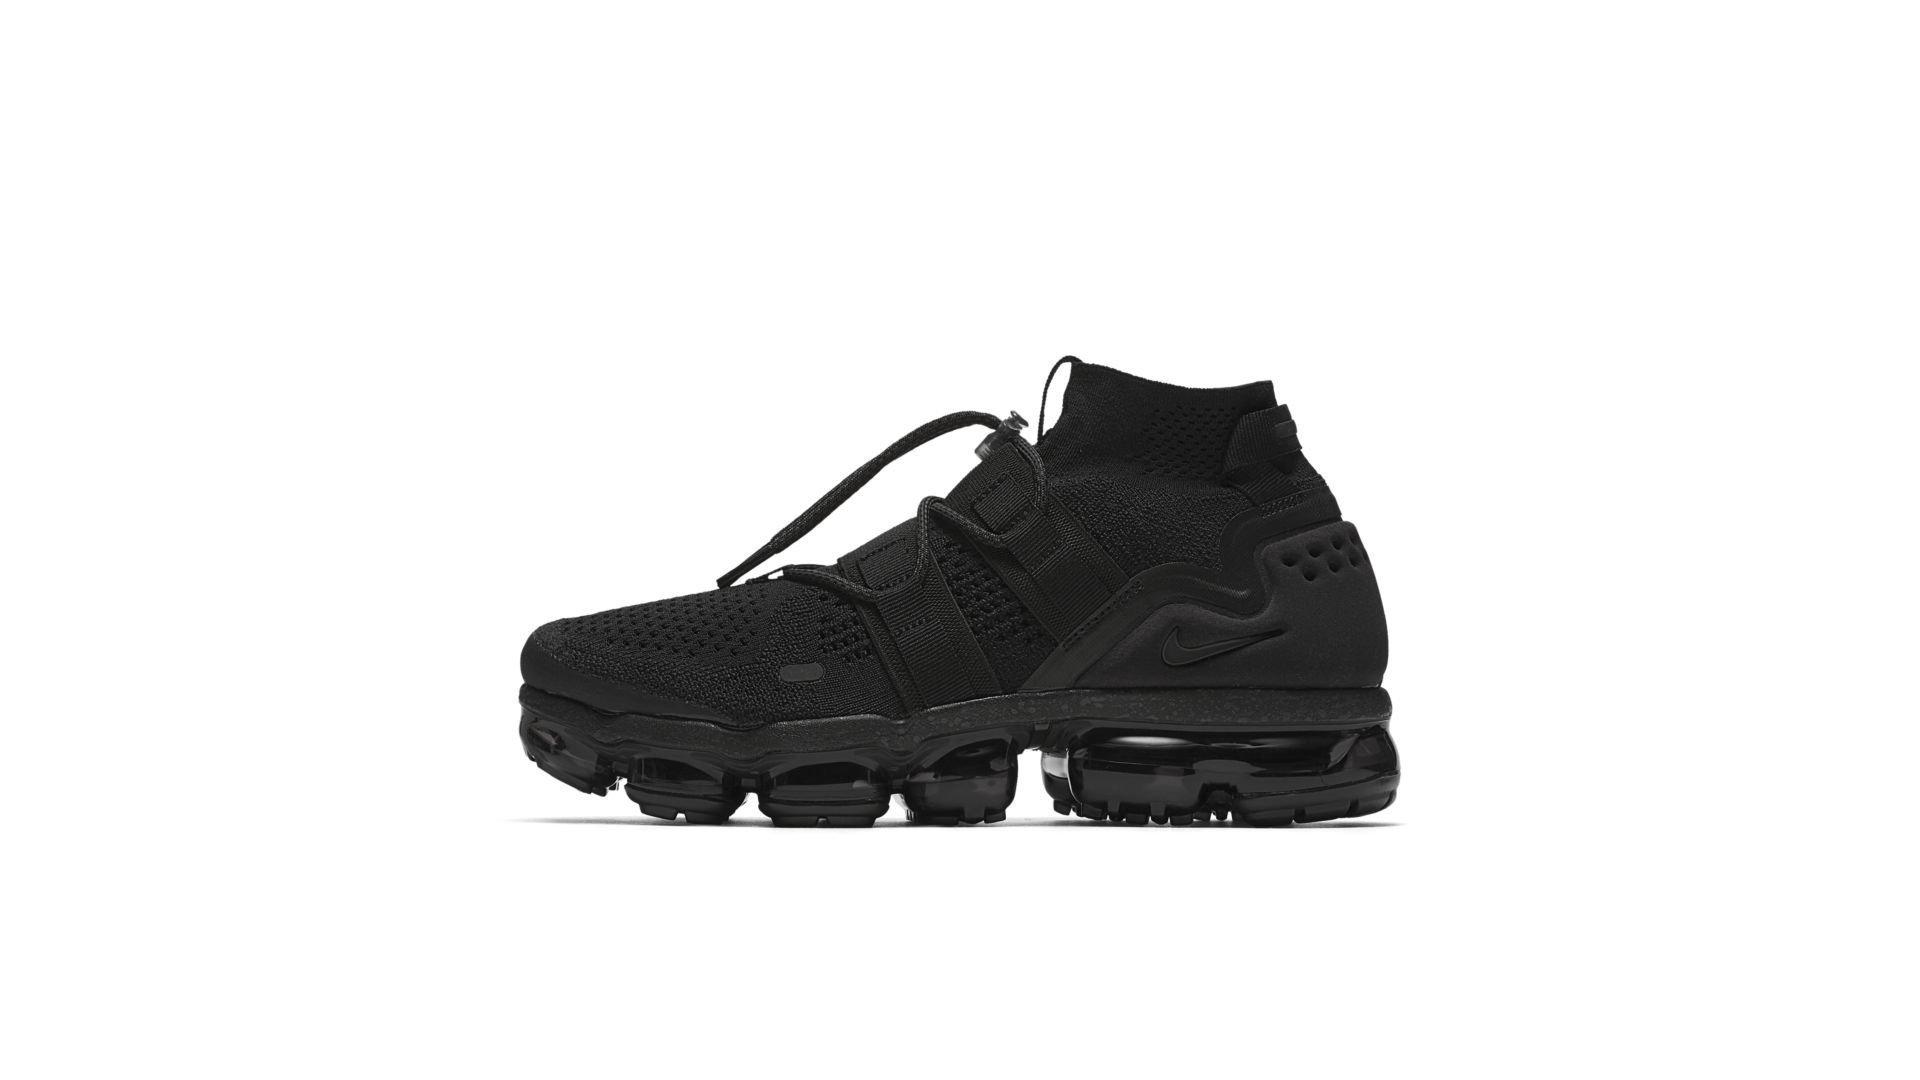 Nike Air VaporMax Utility Black (AH6834-001)